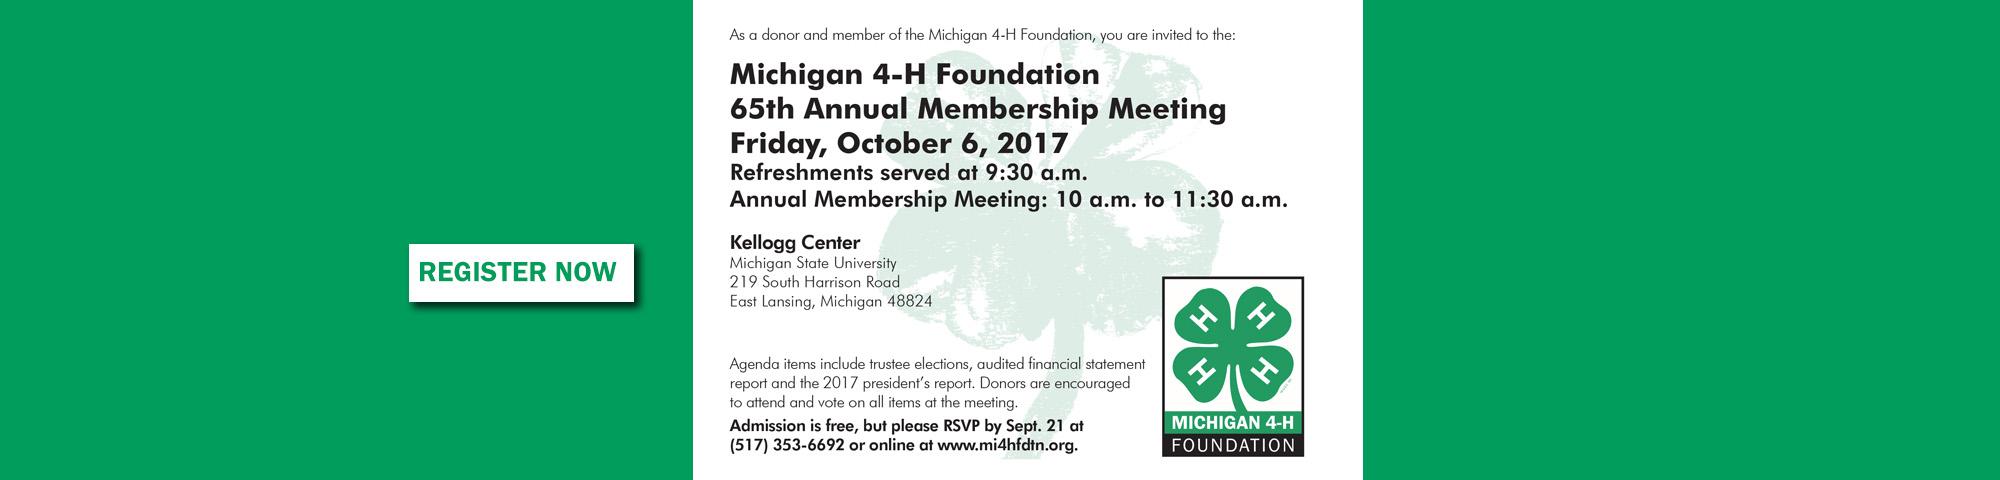 Michigan 4-H Foundation 65th Annual Membership Meeting. October 6, 2017